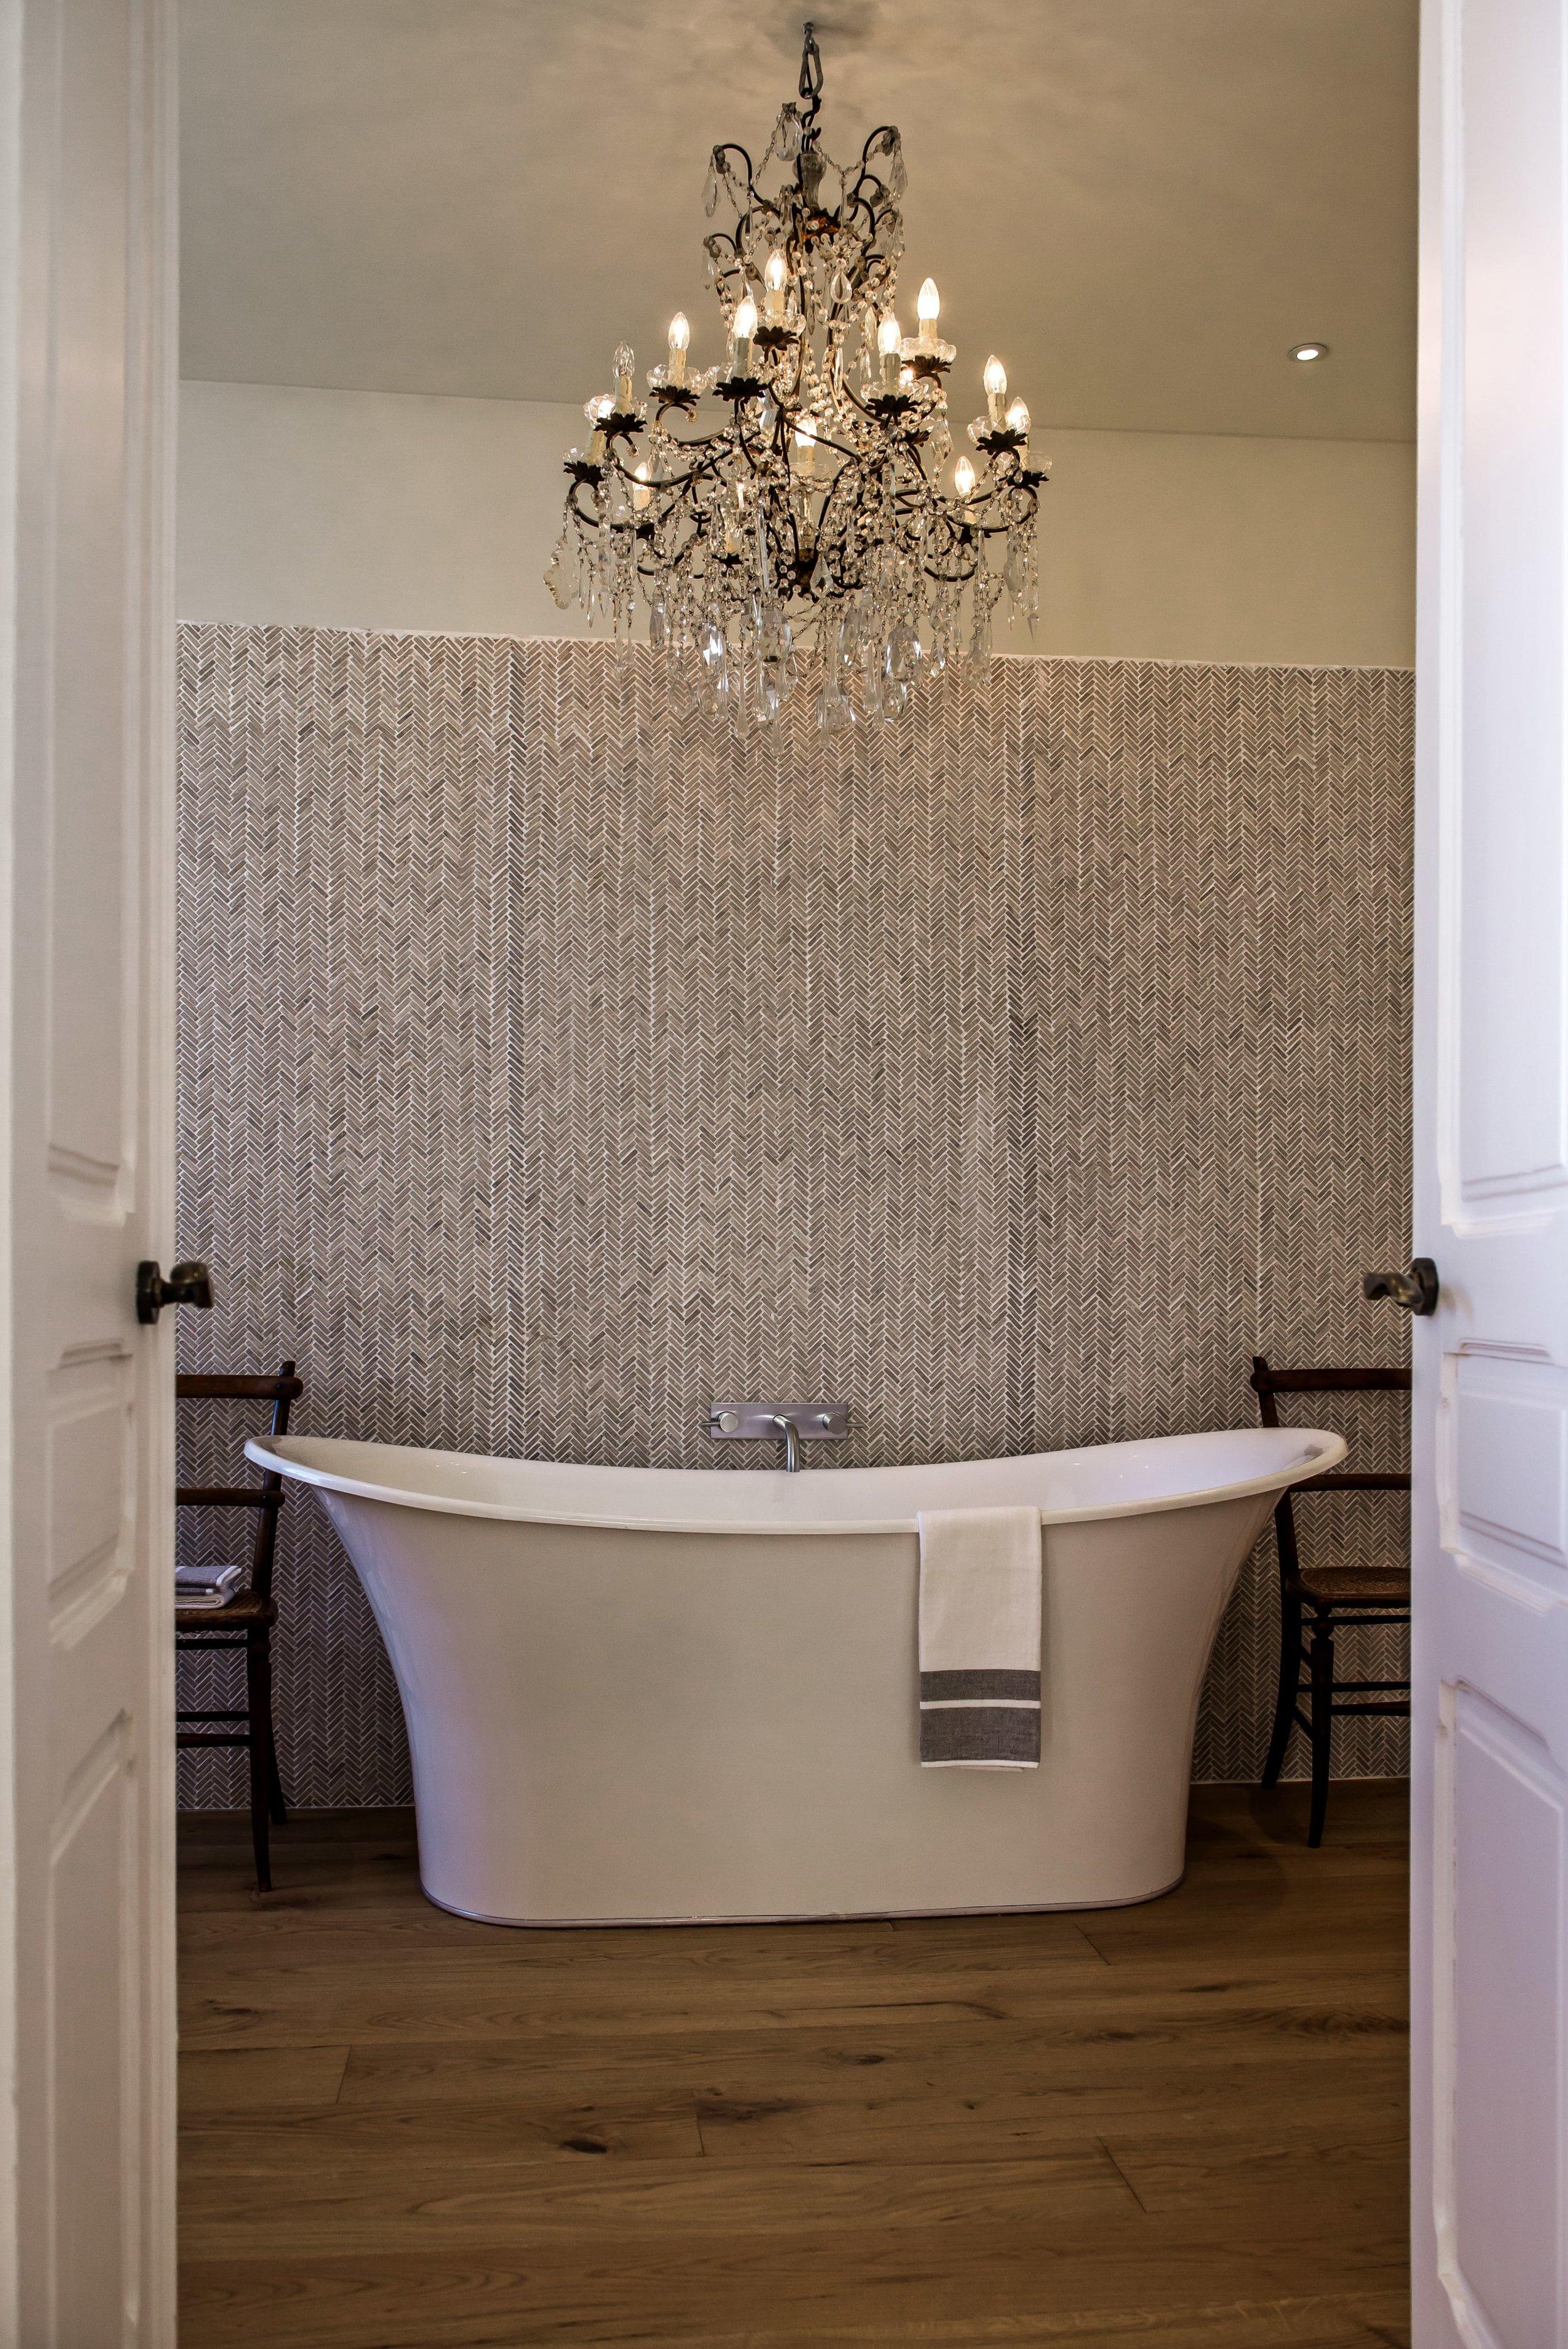 the Crystal suite - Casa Fuzetta (65)-min.jpg